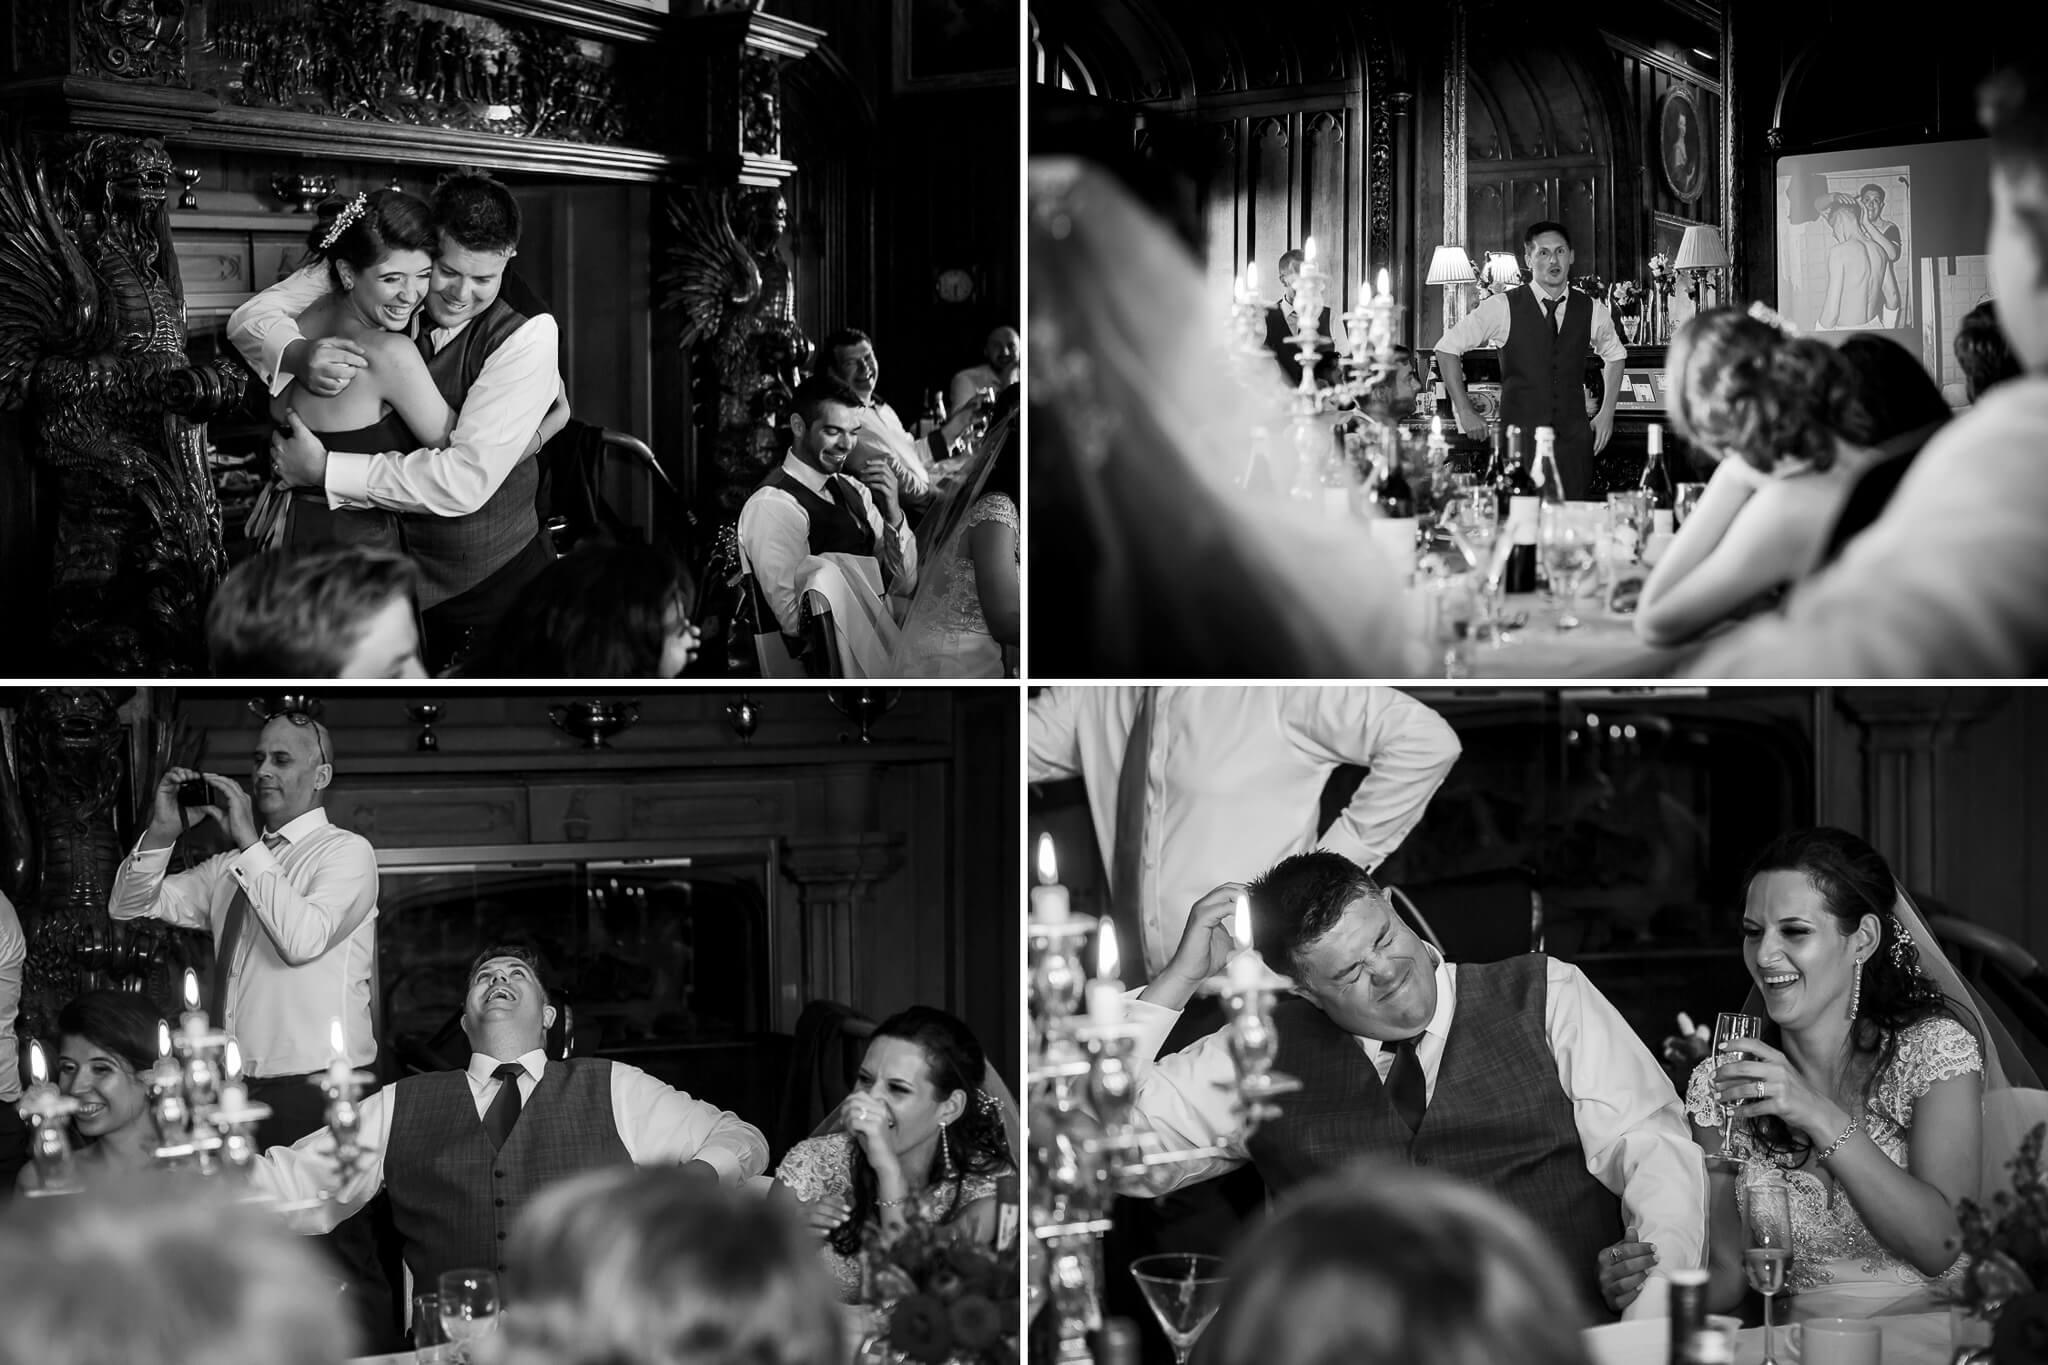 duns-castle-wedding-photograper-scotland-stanbury-photography-017